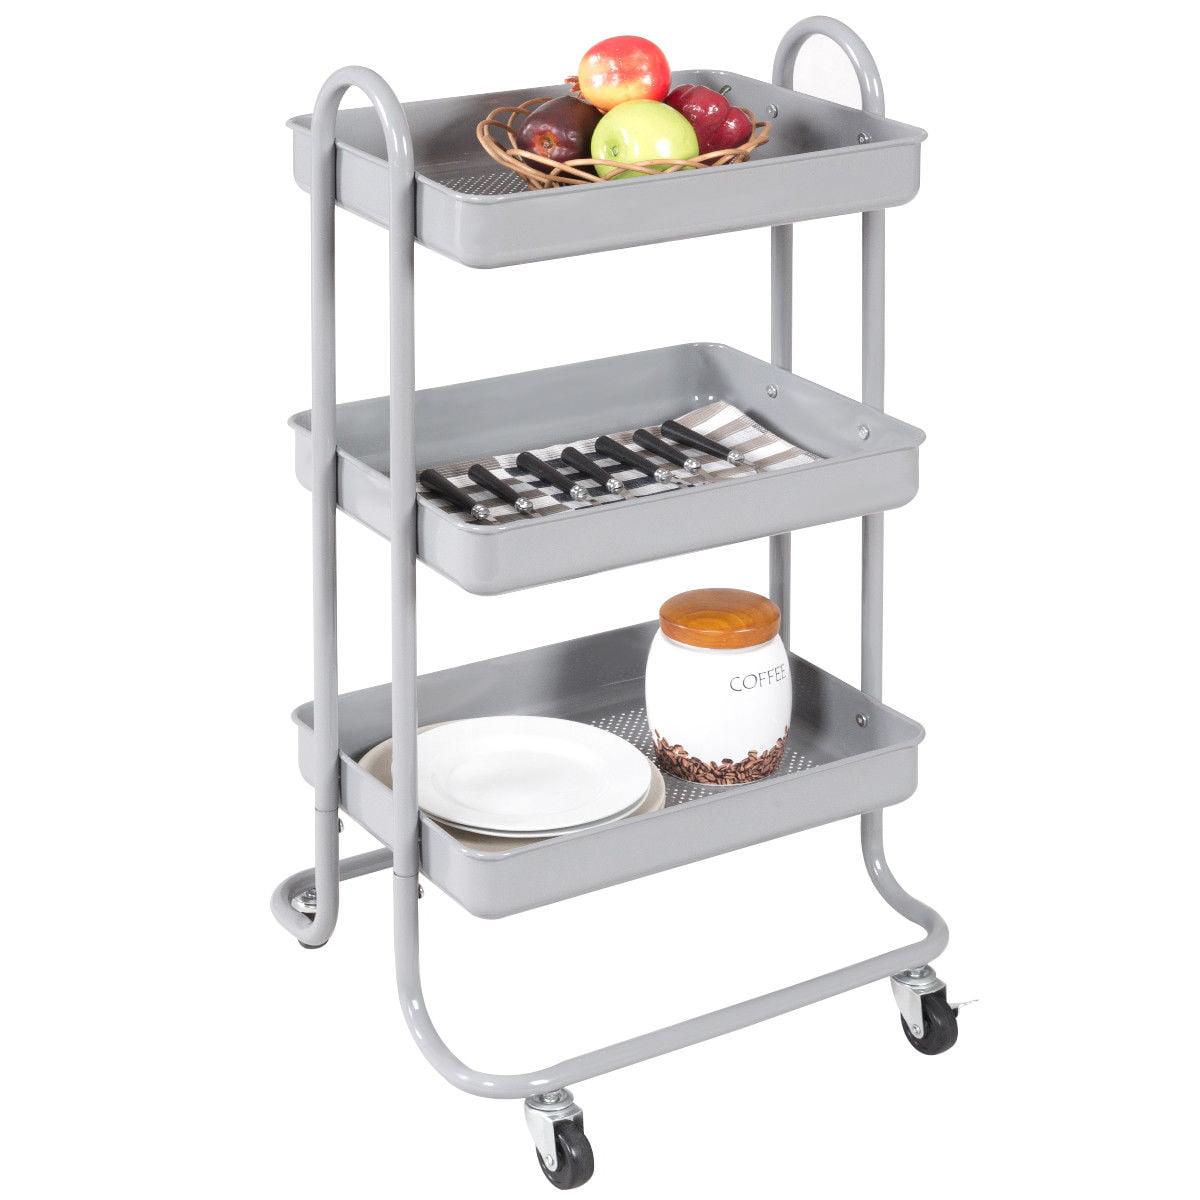 Costway 3-Tier Steel Rolling Kitchen Trolley Cart Storage Serving ...